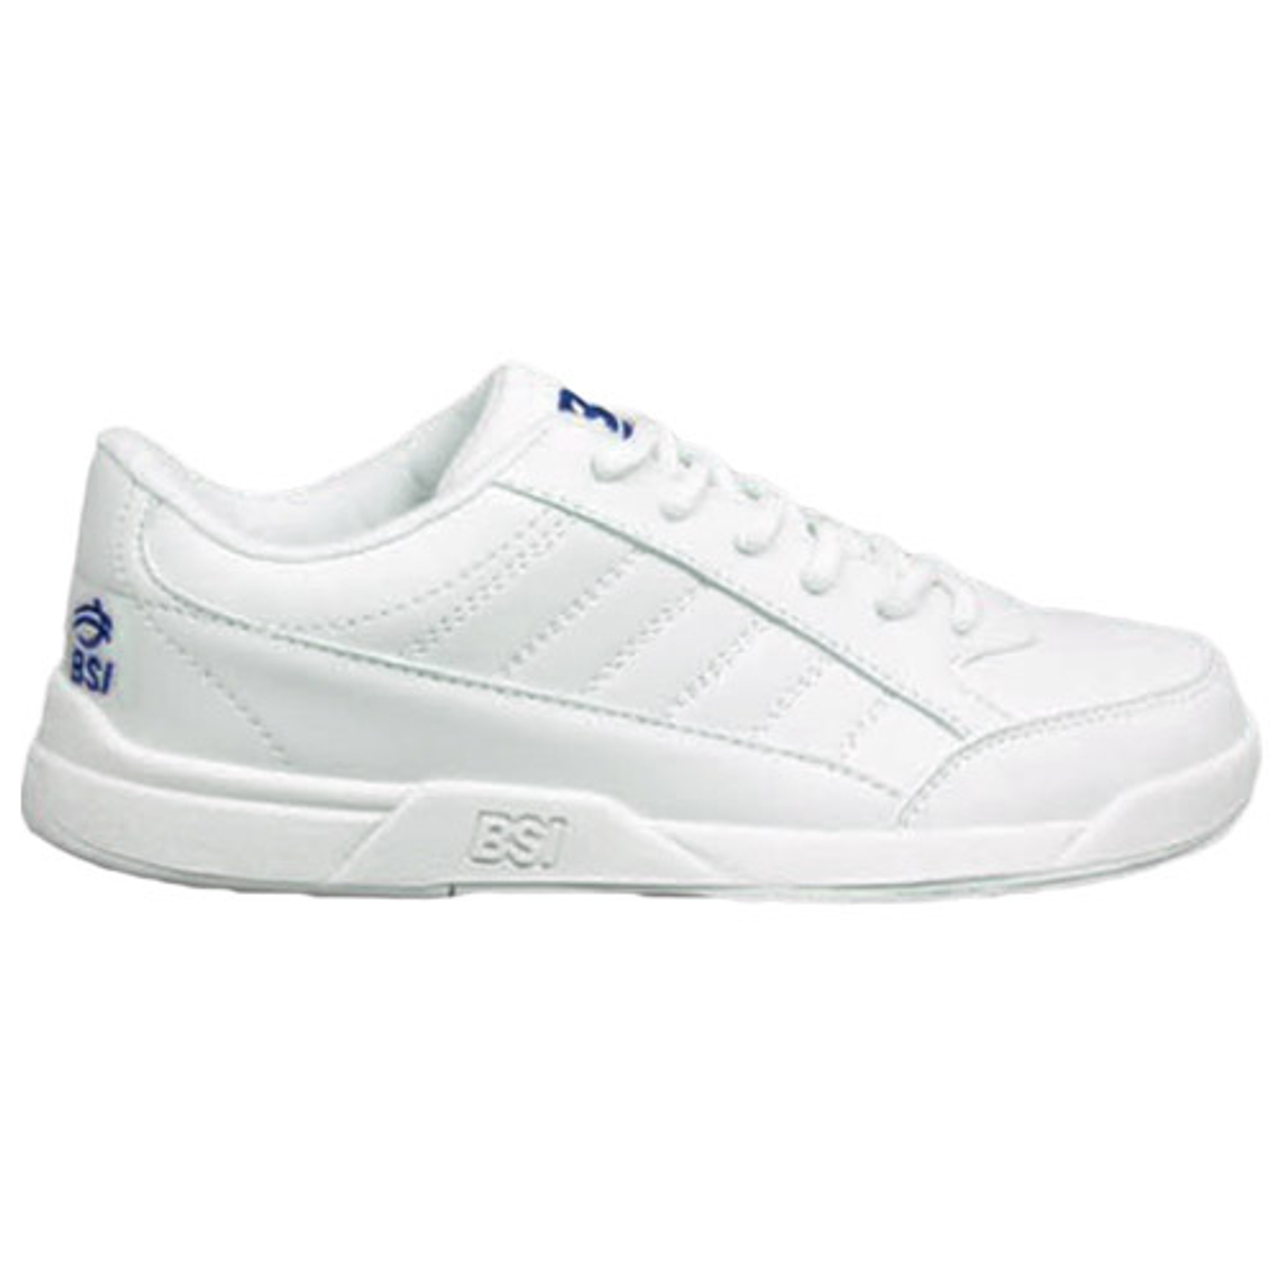 BSI Boys Basic #532 Bowling Shoes